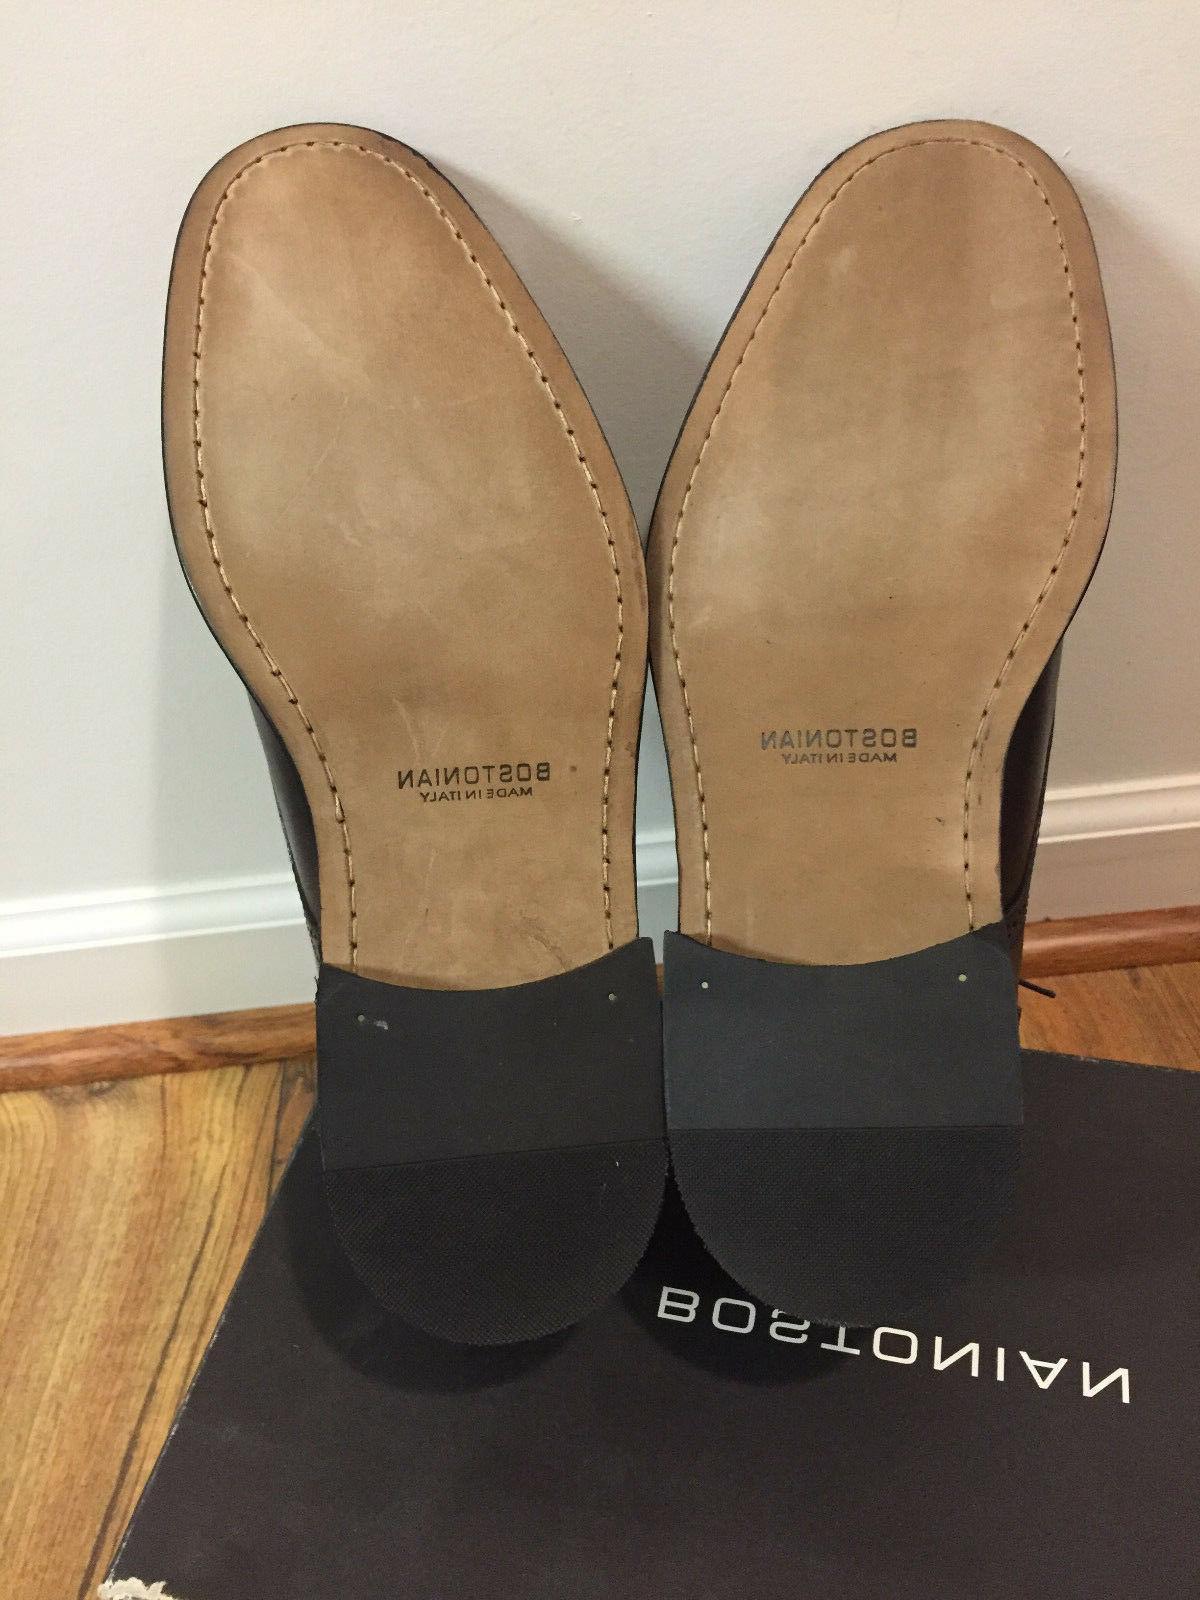 Bostonian Burgundy Leather Oxford Size 11.5